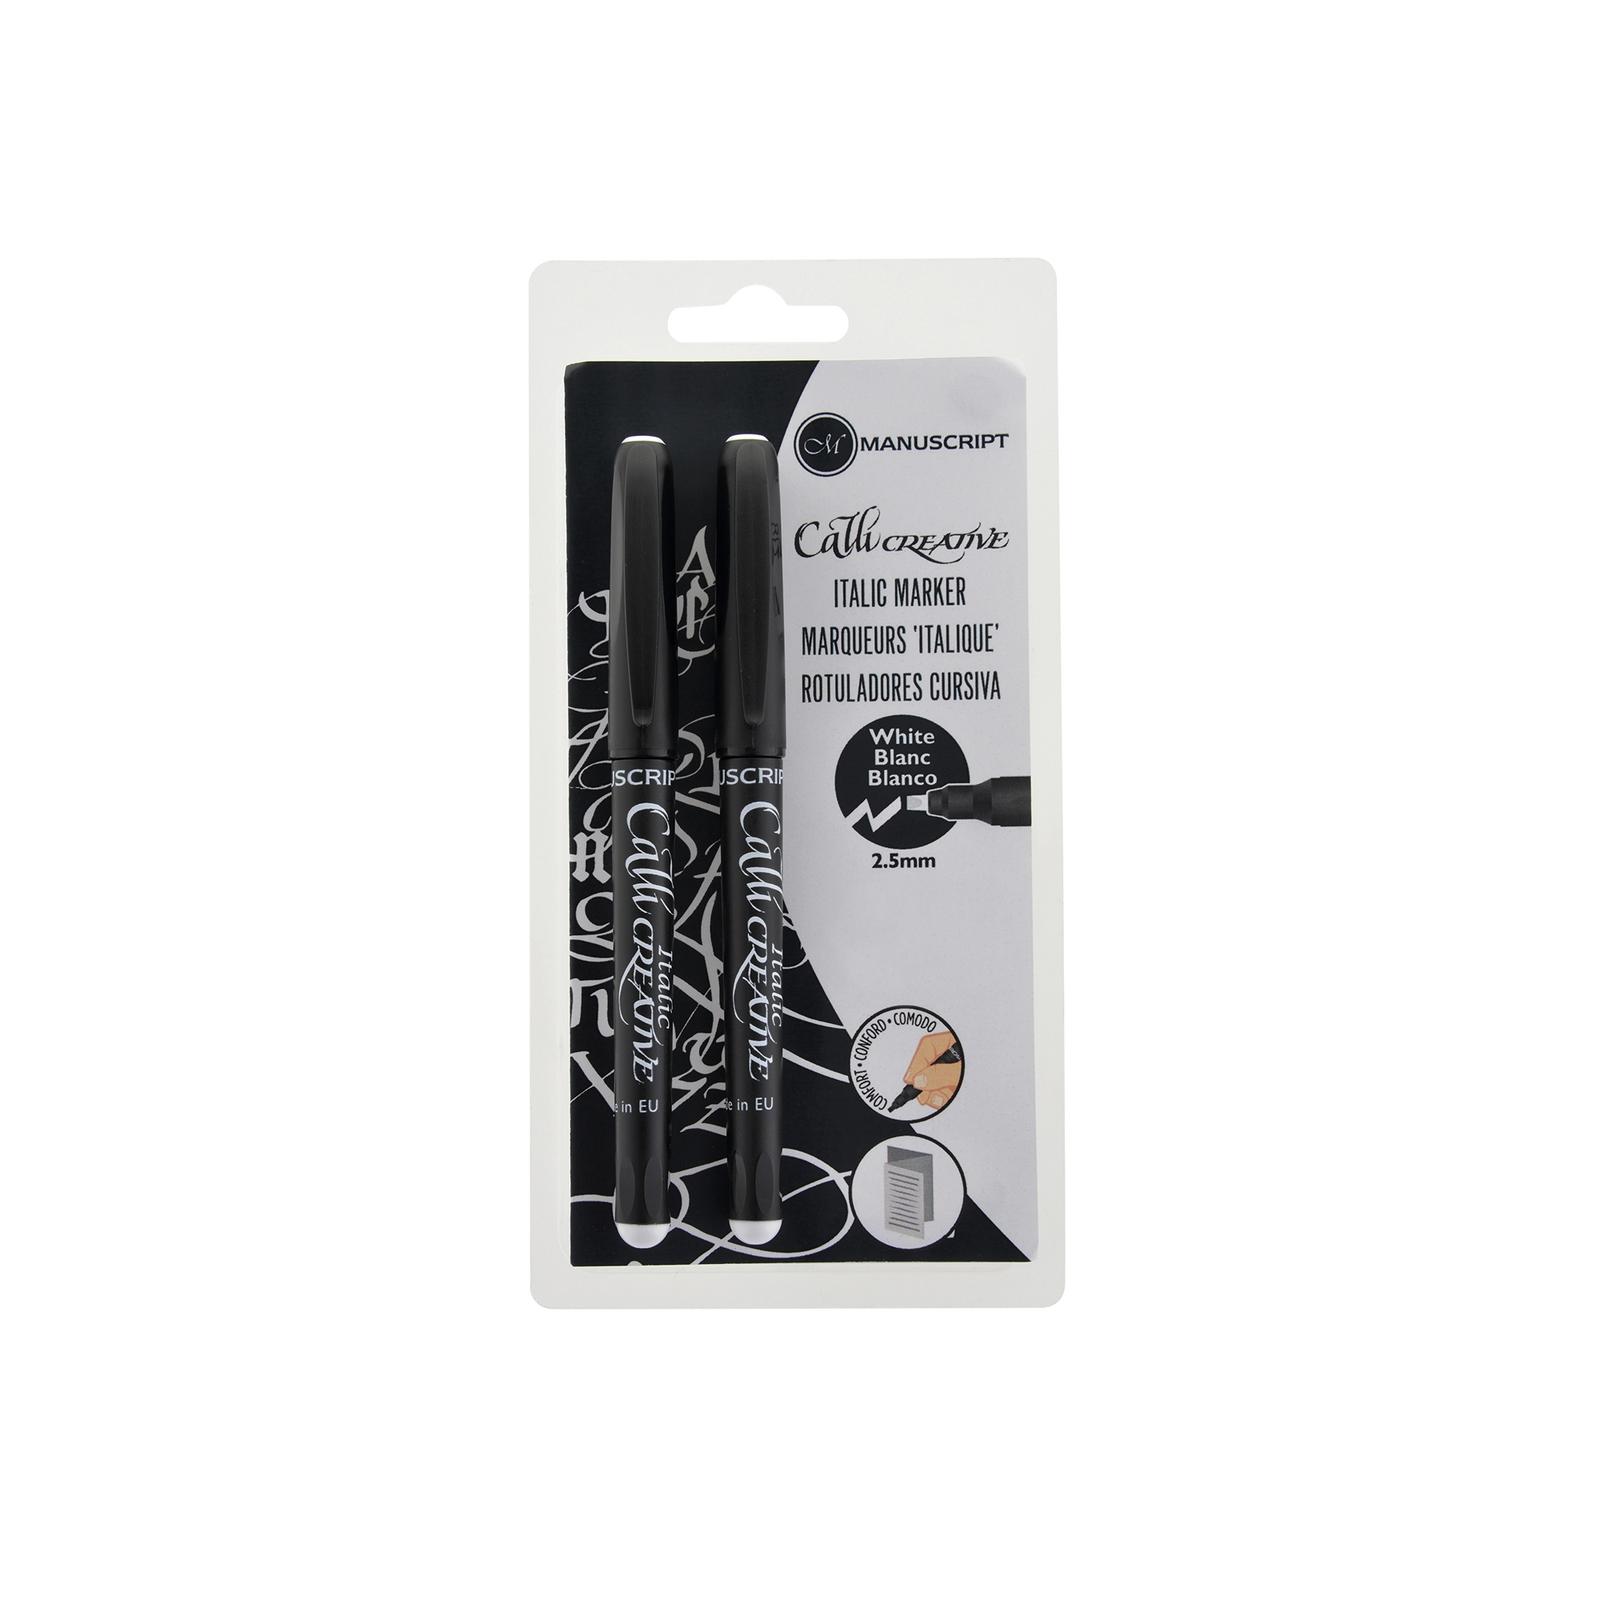 Manuscript Italian Markers - White - Pack of 2